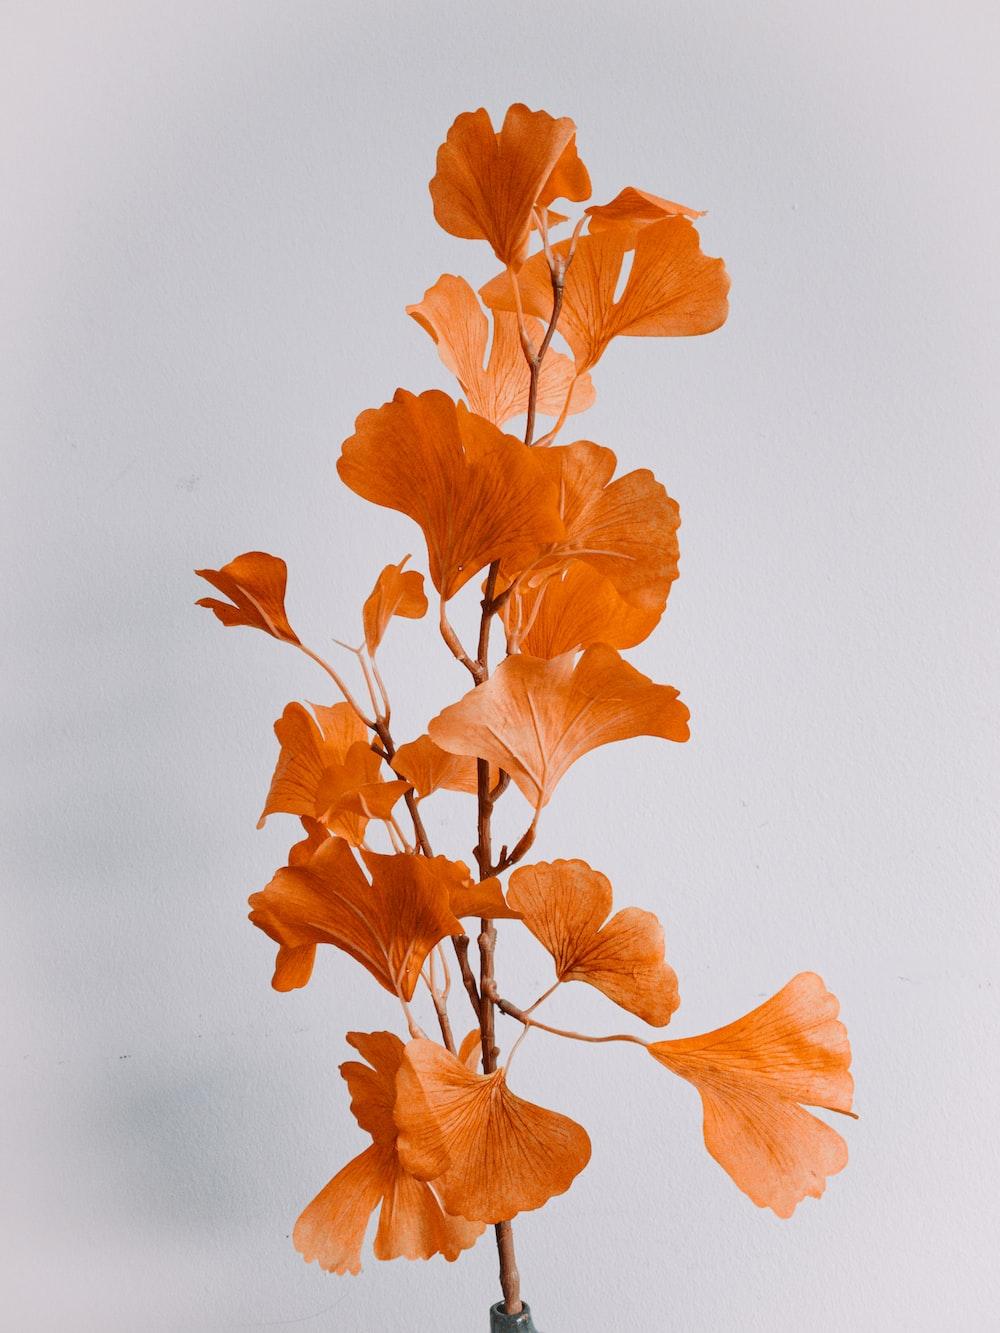 orange leaves on white surface